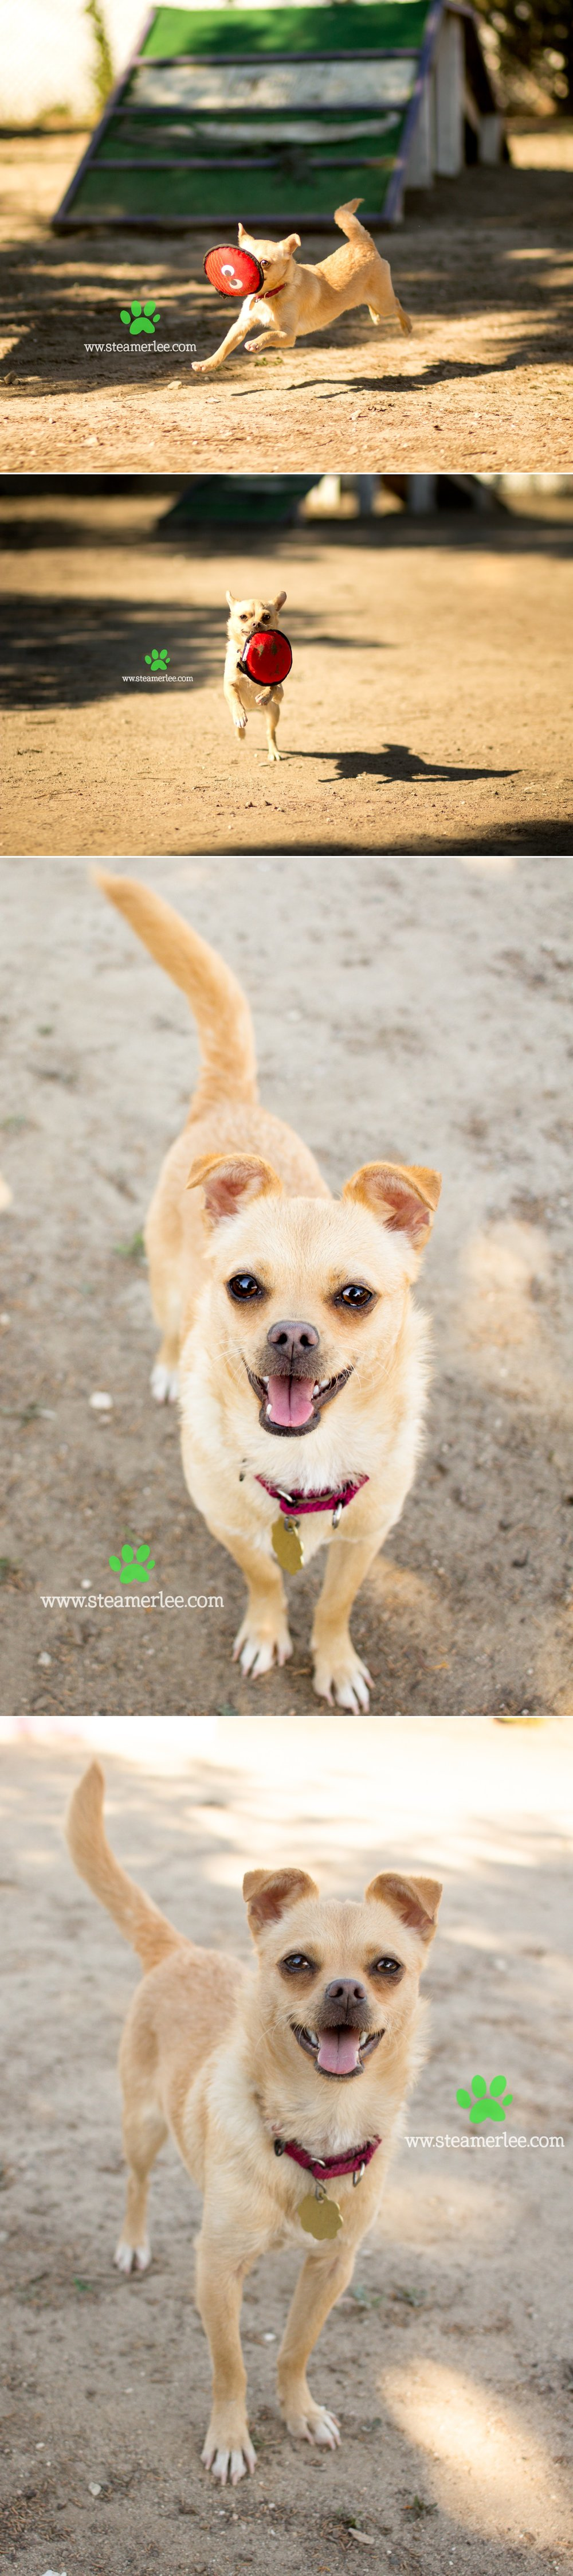 10 Steamer Lee Dog Photography - Seal Beach Animal Care Center.JPG